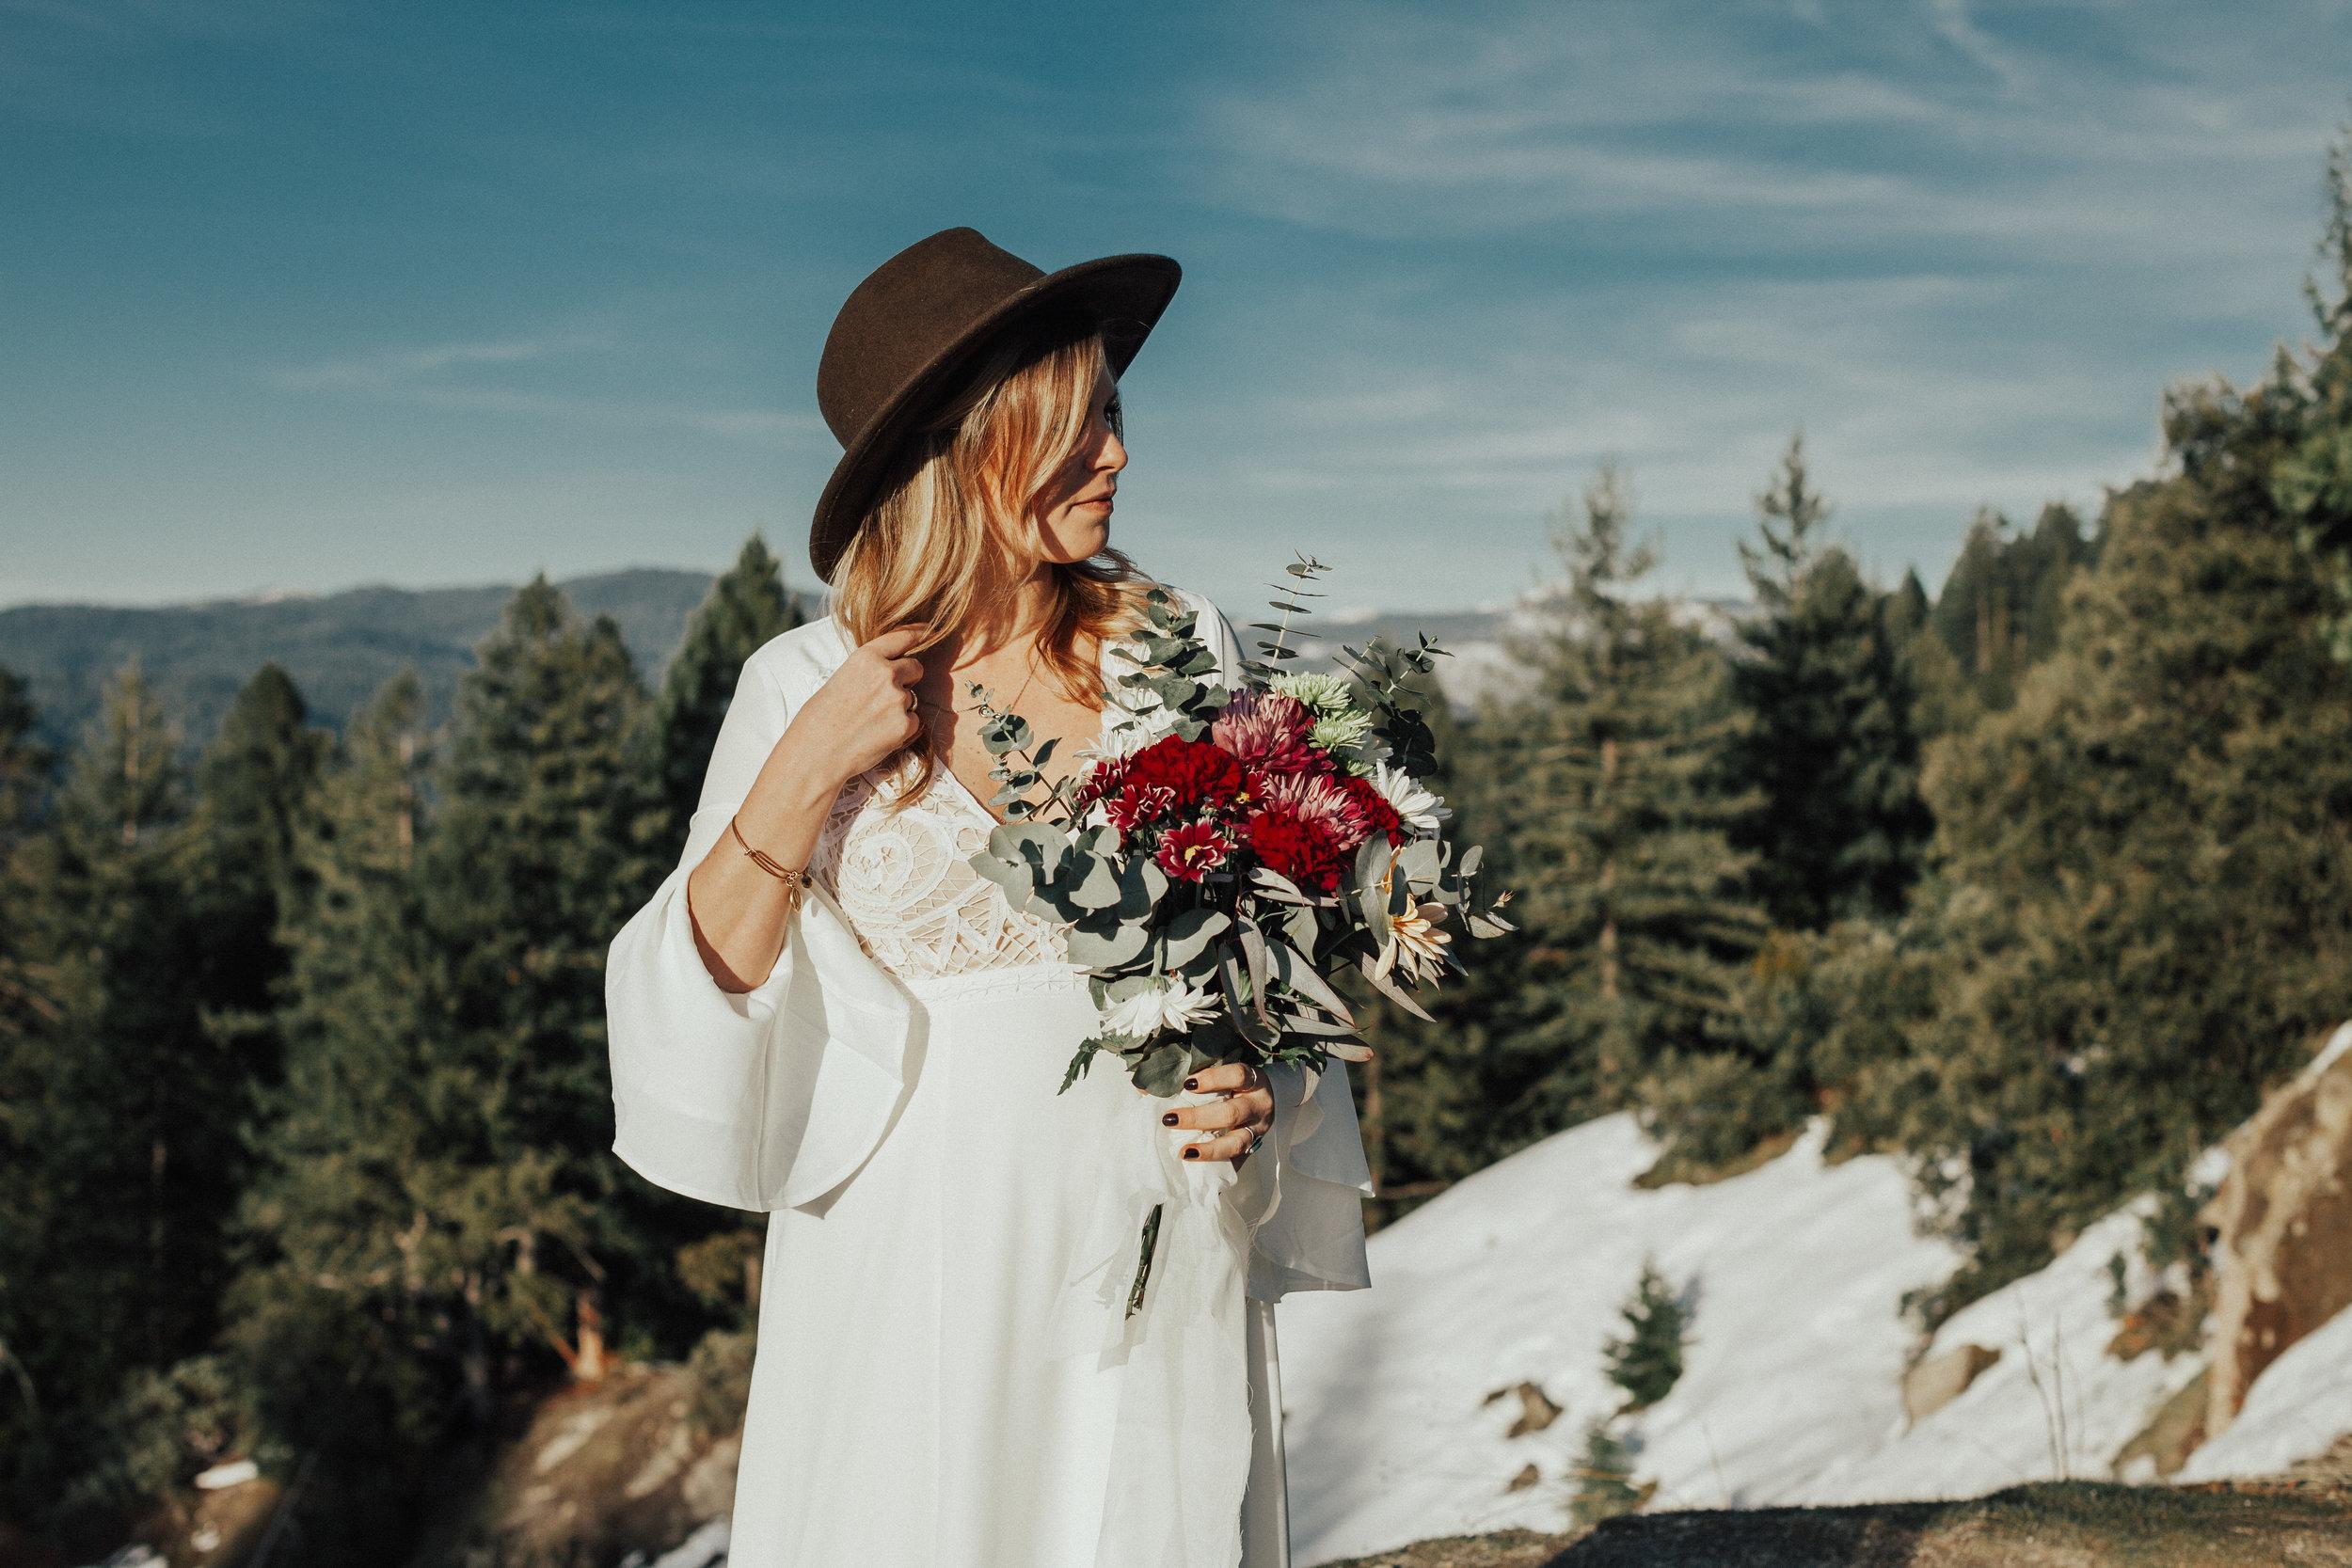 Bridal portrait taken in front of the Sierra Nevada mountains.